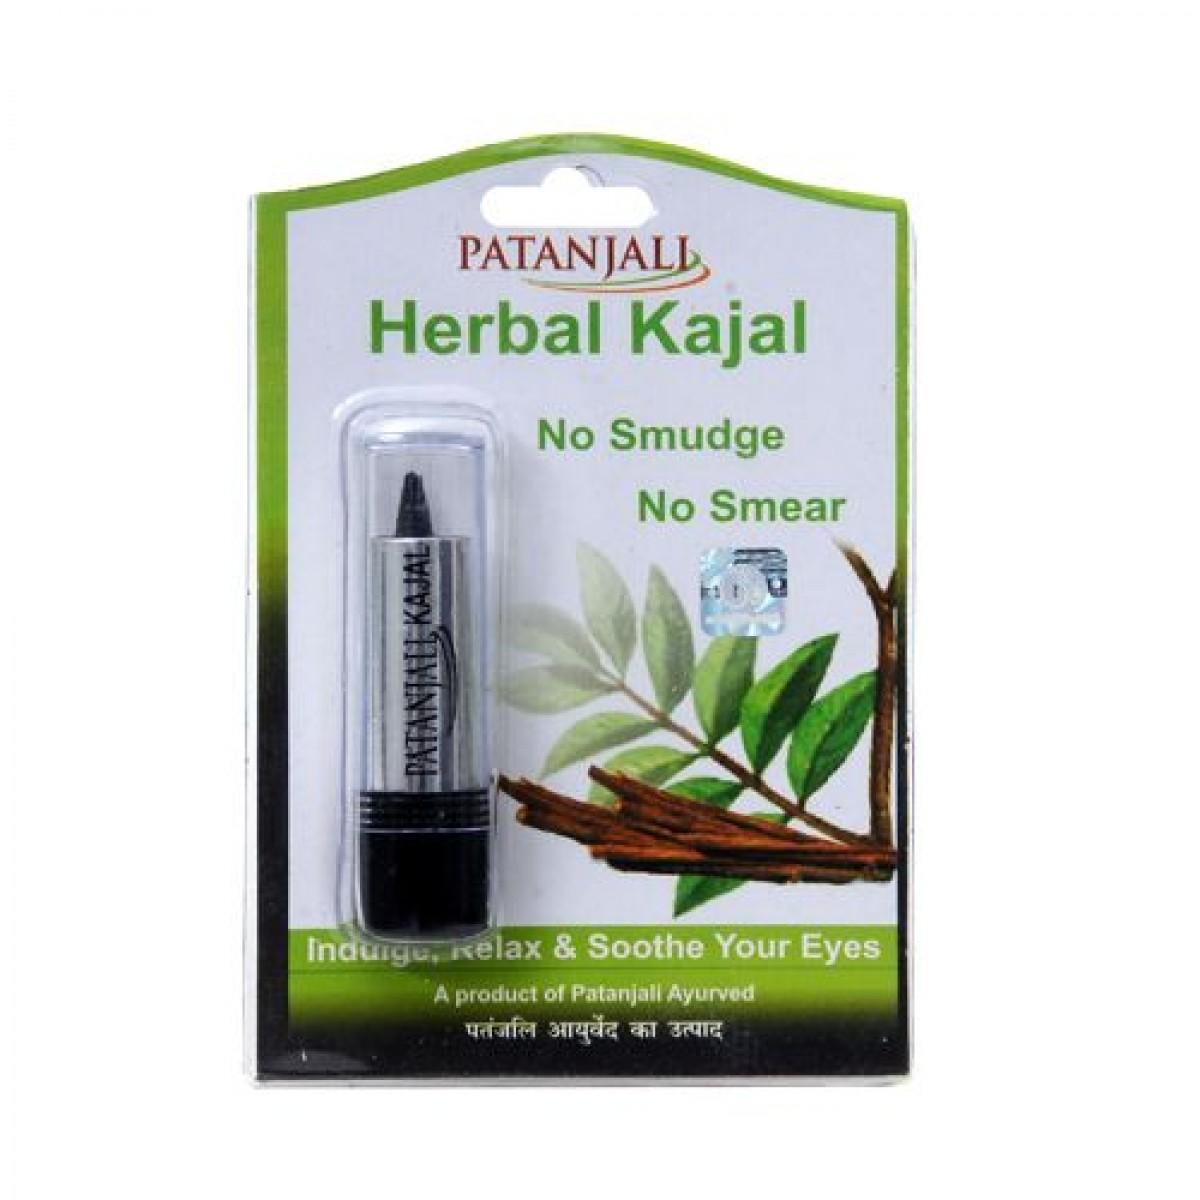 Patanjali Chikistalay Herbal Kajal Image